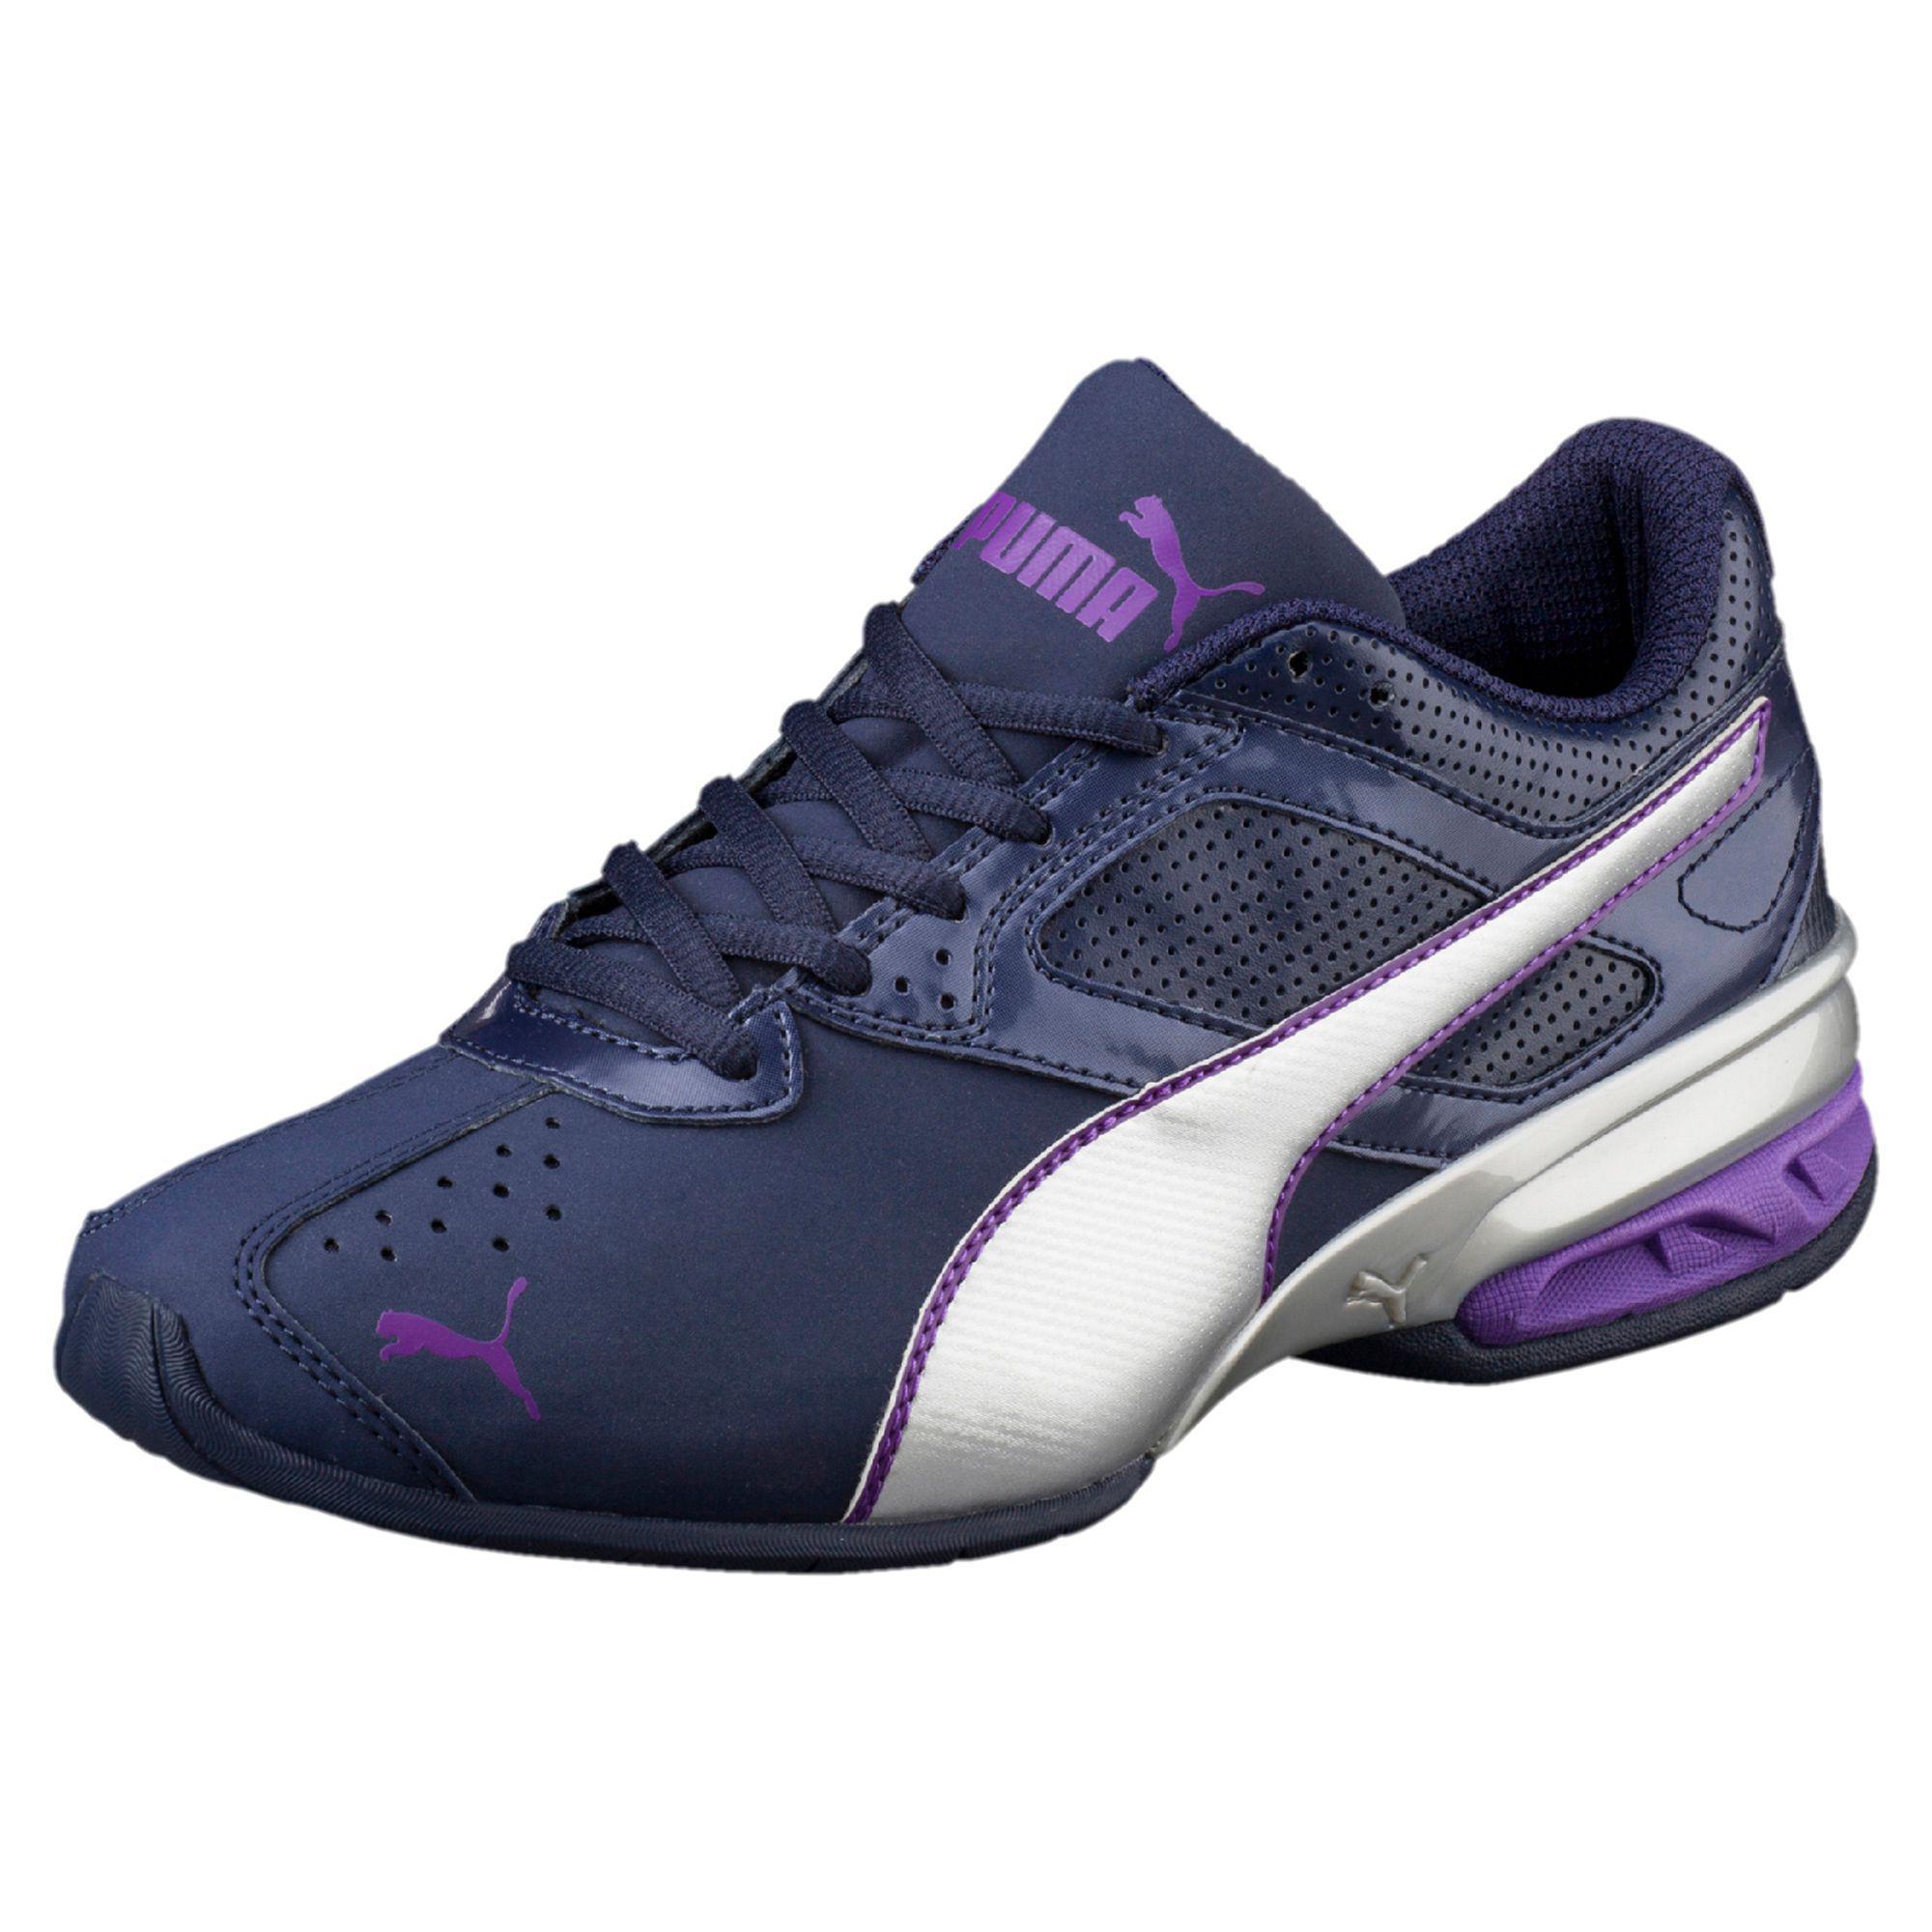 47e25258bf1 Lyst - Puma Tazon 6 Fm Women s Running Shoes in Blue